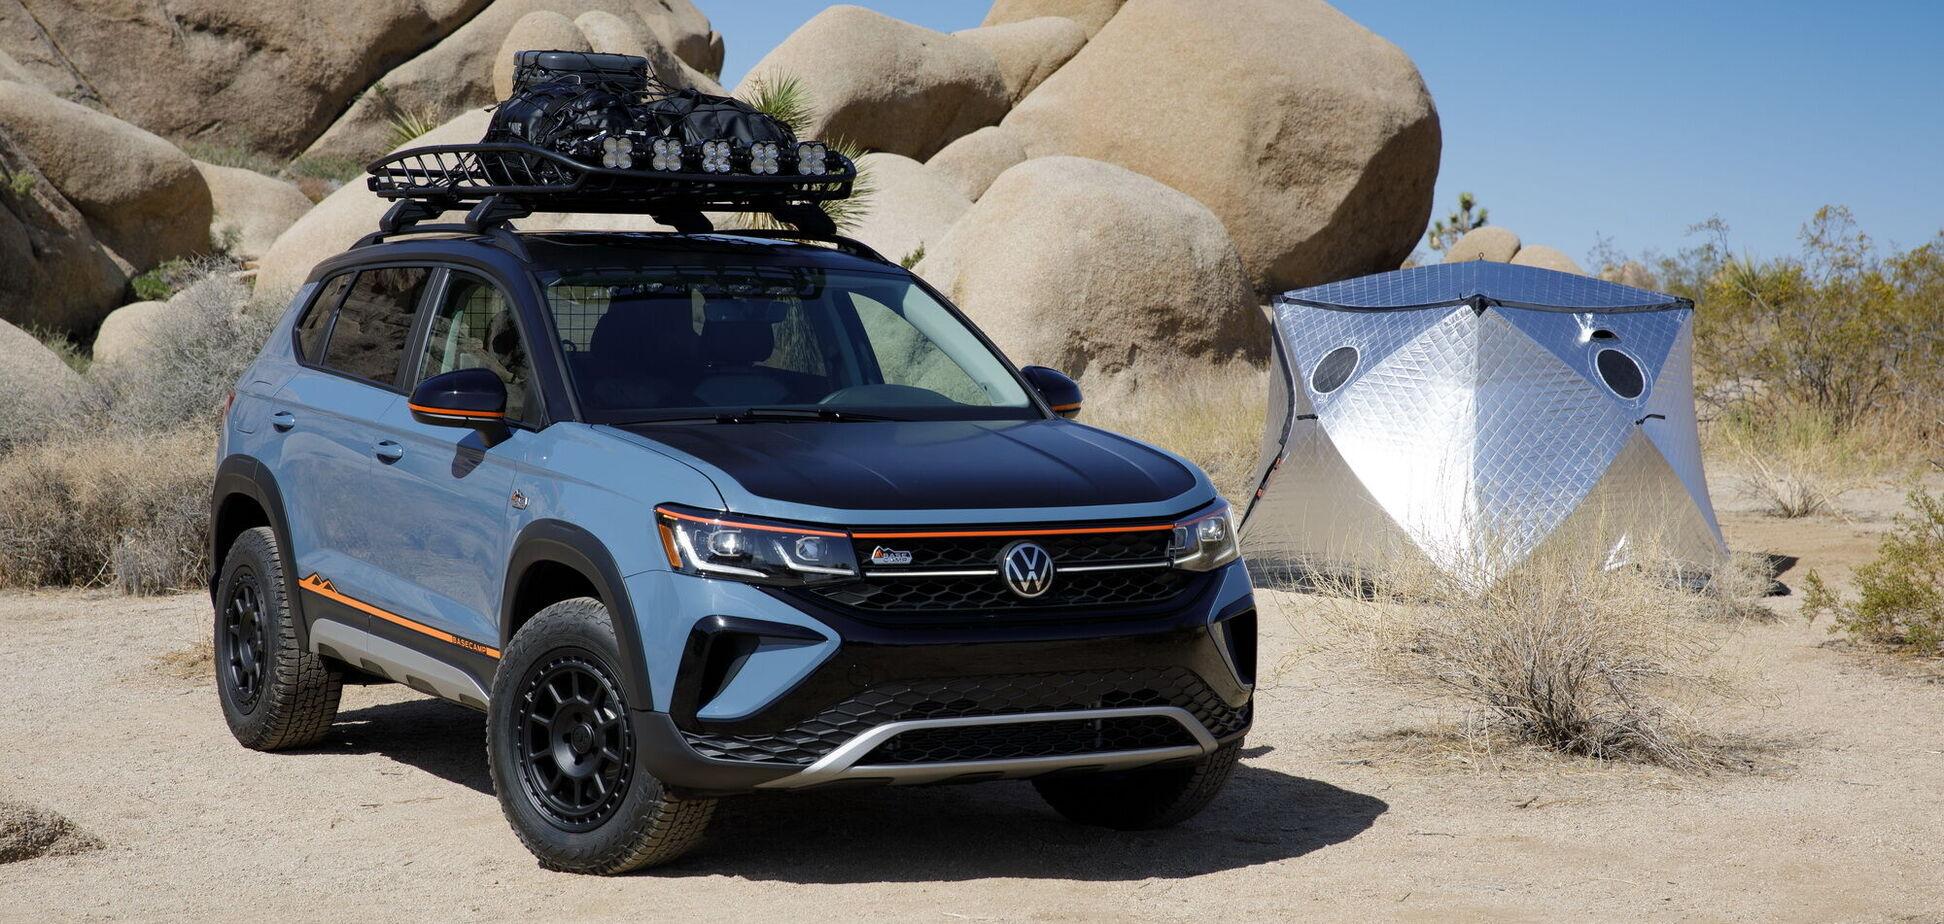 Volkswagen представил концепт Taos Basecamp для туристов